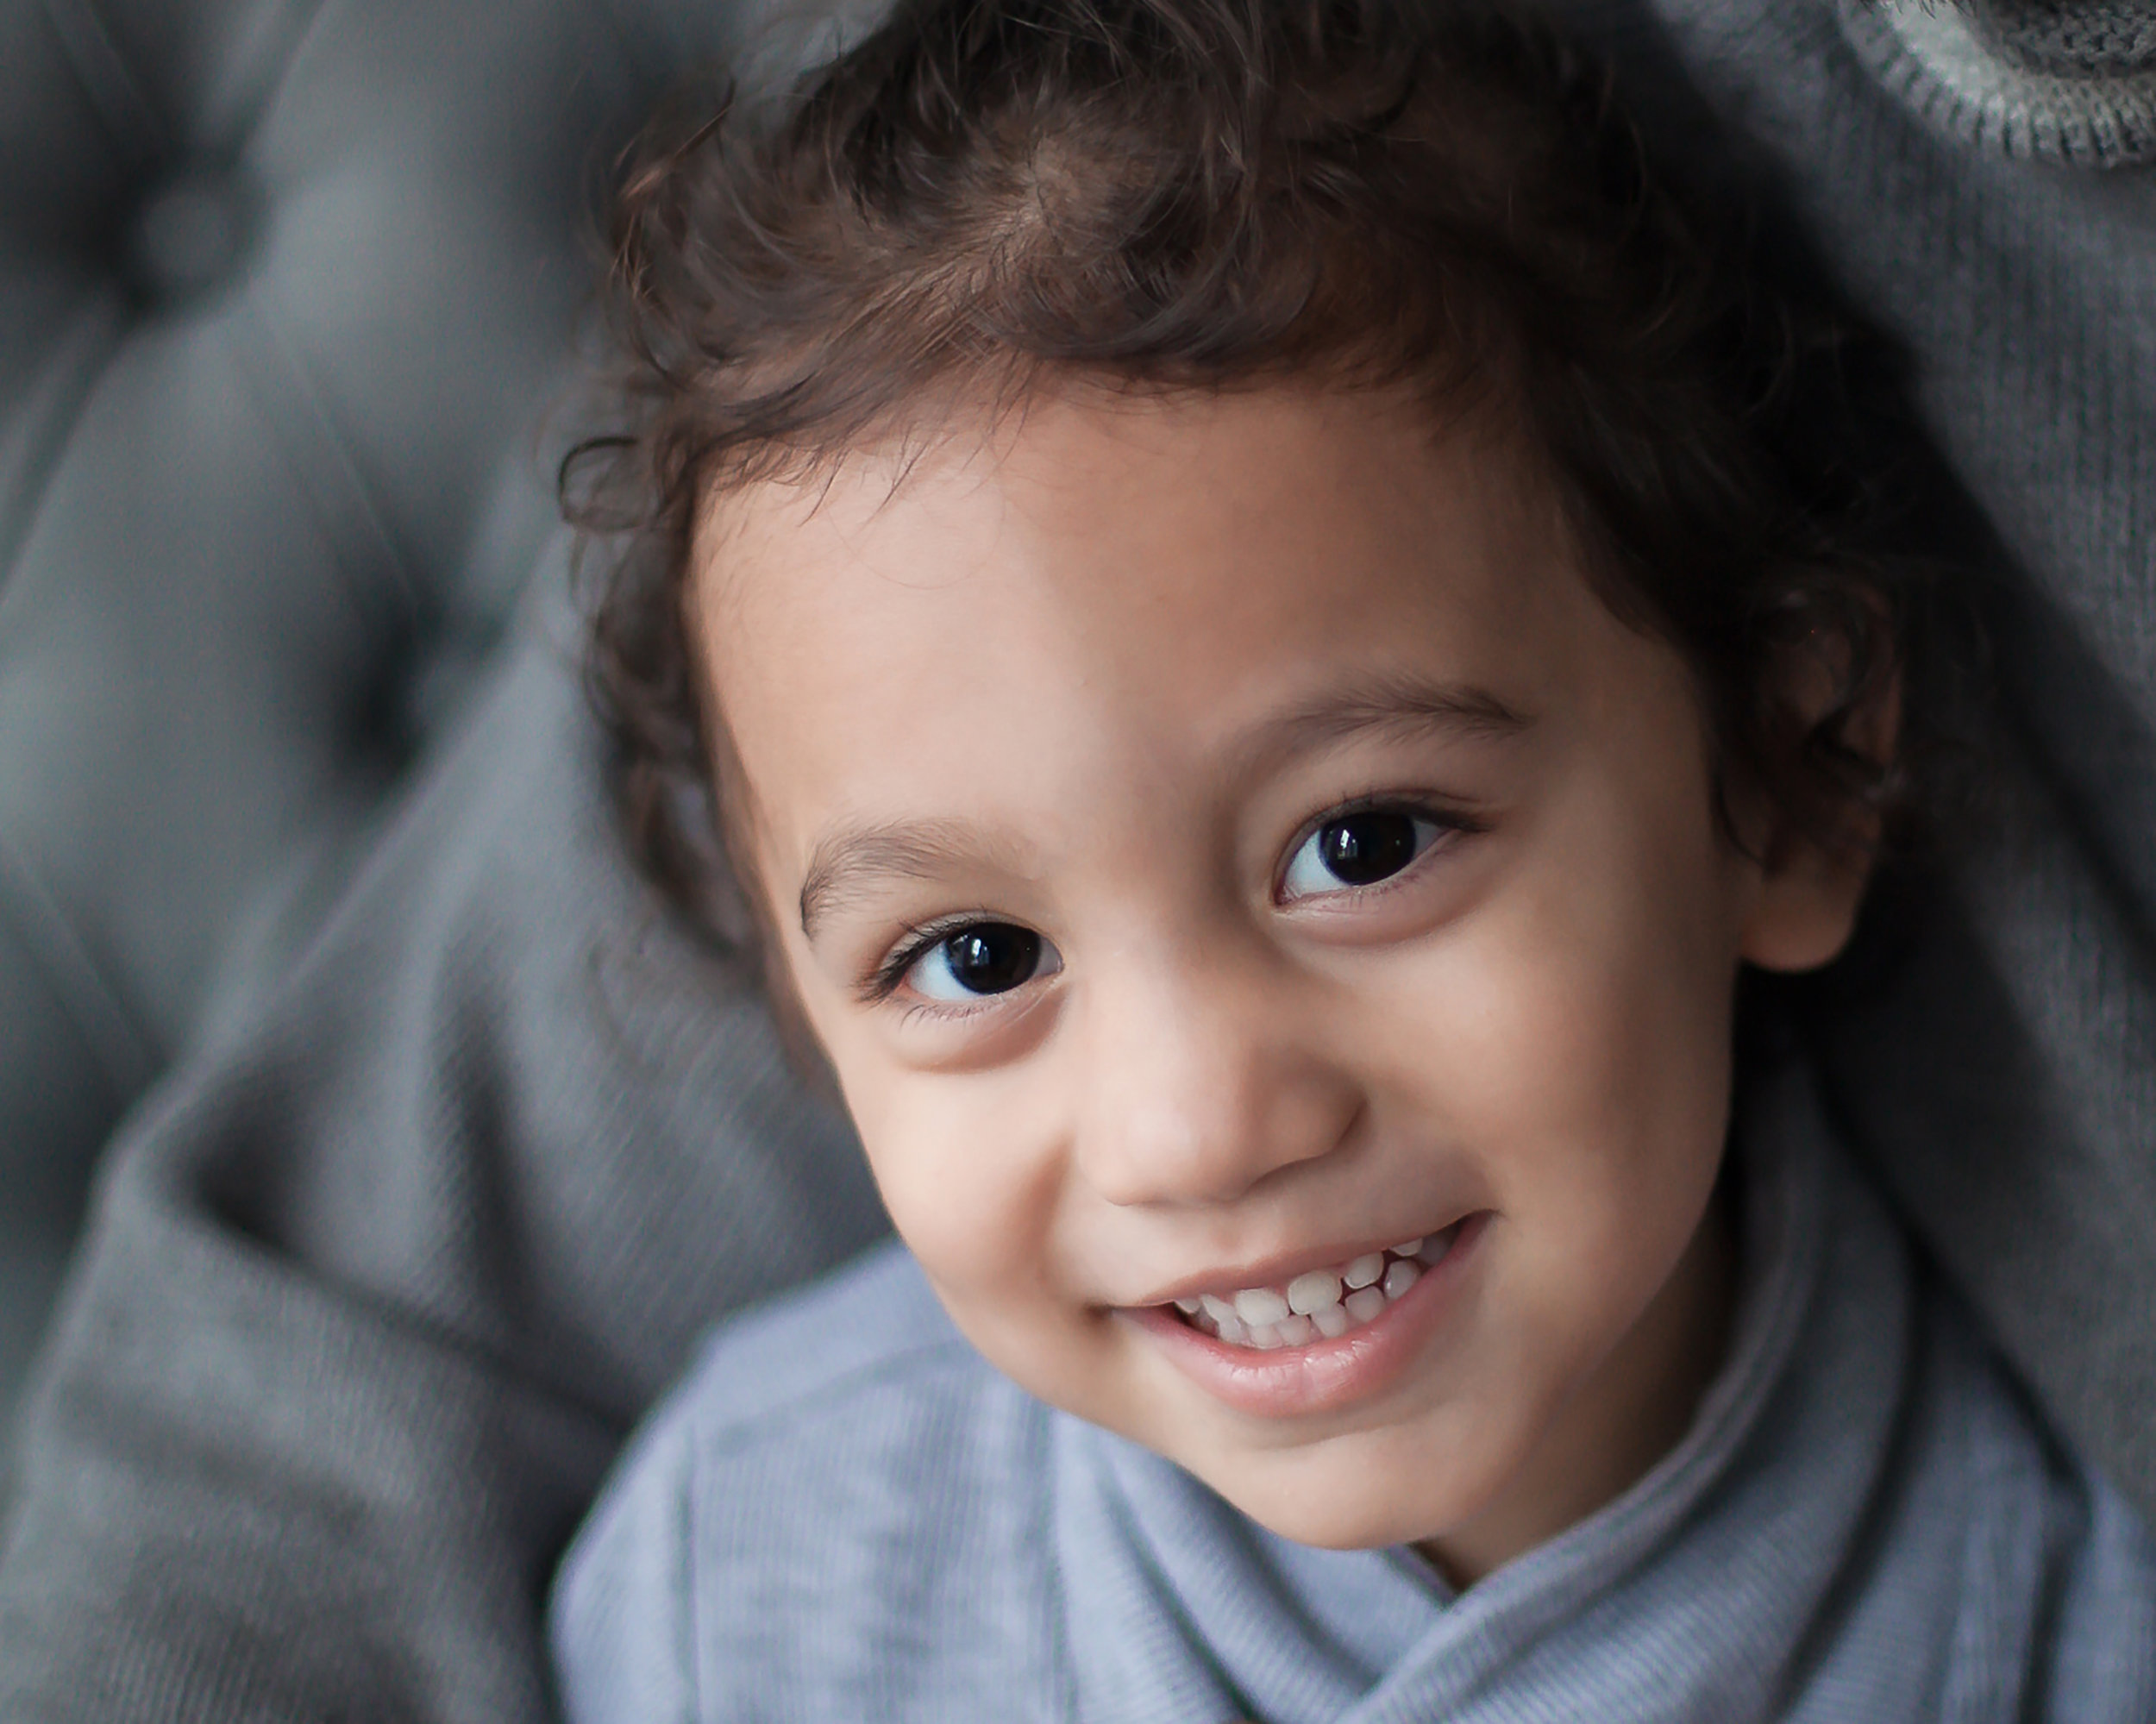 Toronto_Child_Fine_Art_Portrait_Photographer_Petra_King_Photography